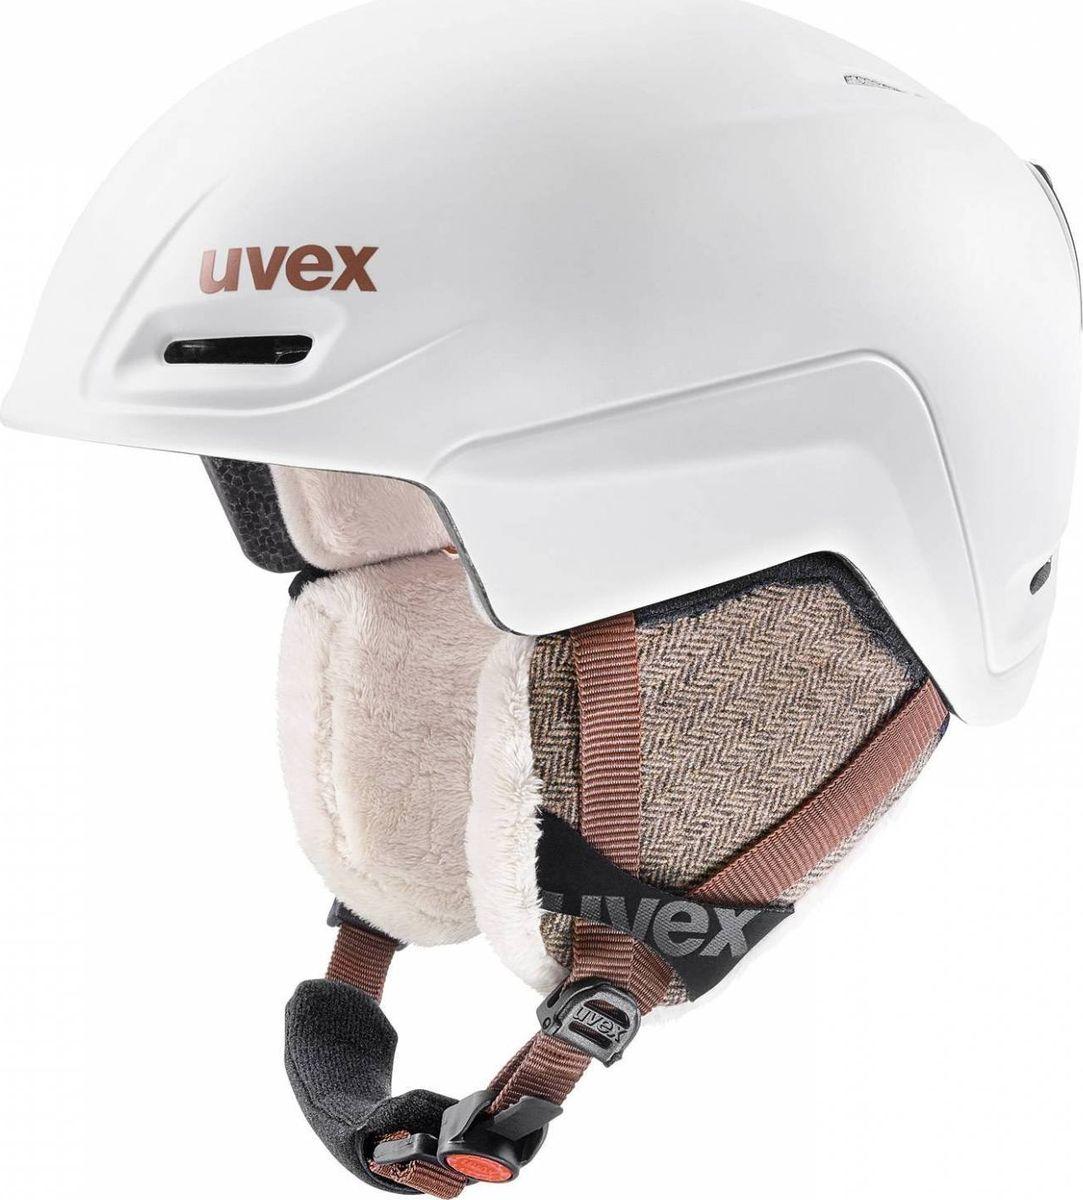 Шлем горнолыжный Uvex  Jimm Helmet , цвет: белый матовый. Размер S - Горные лыжи